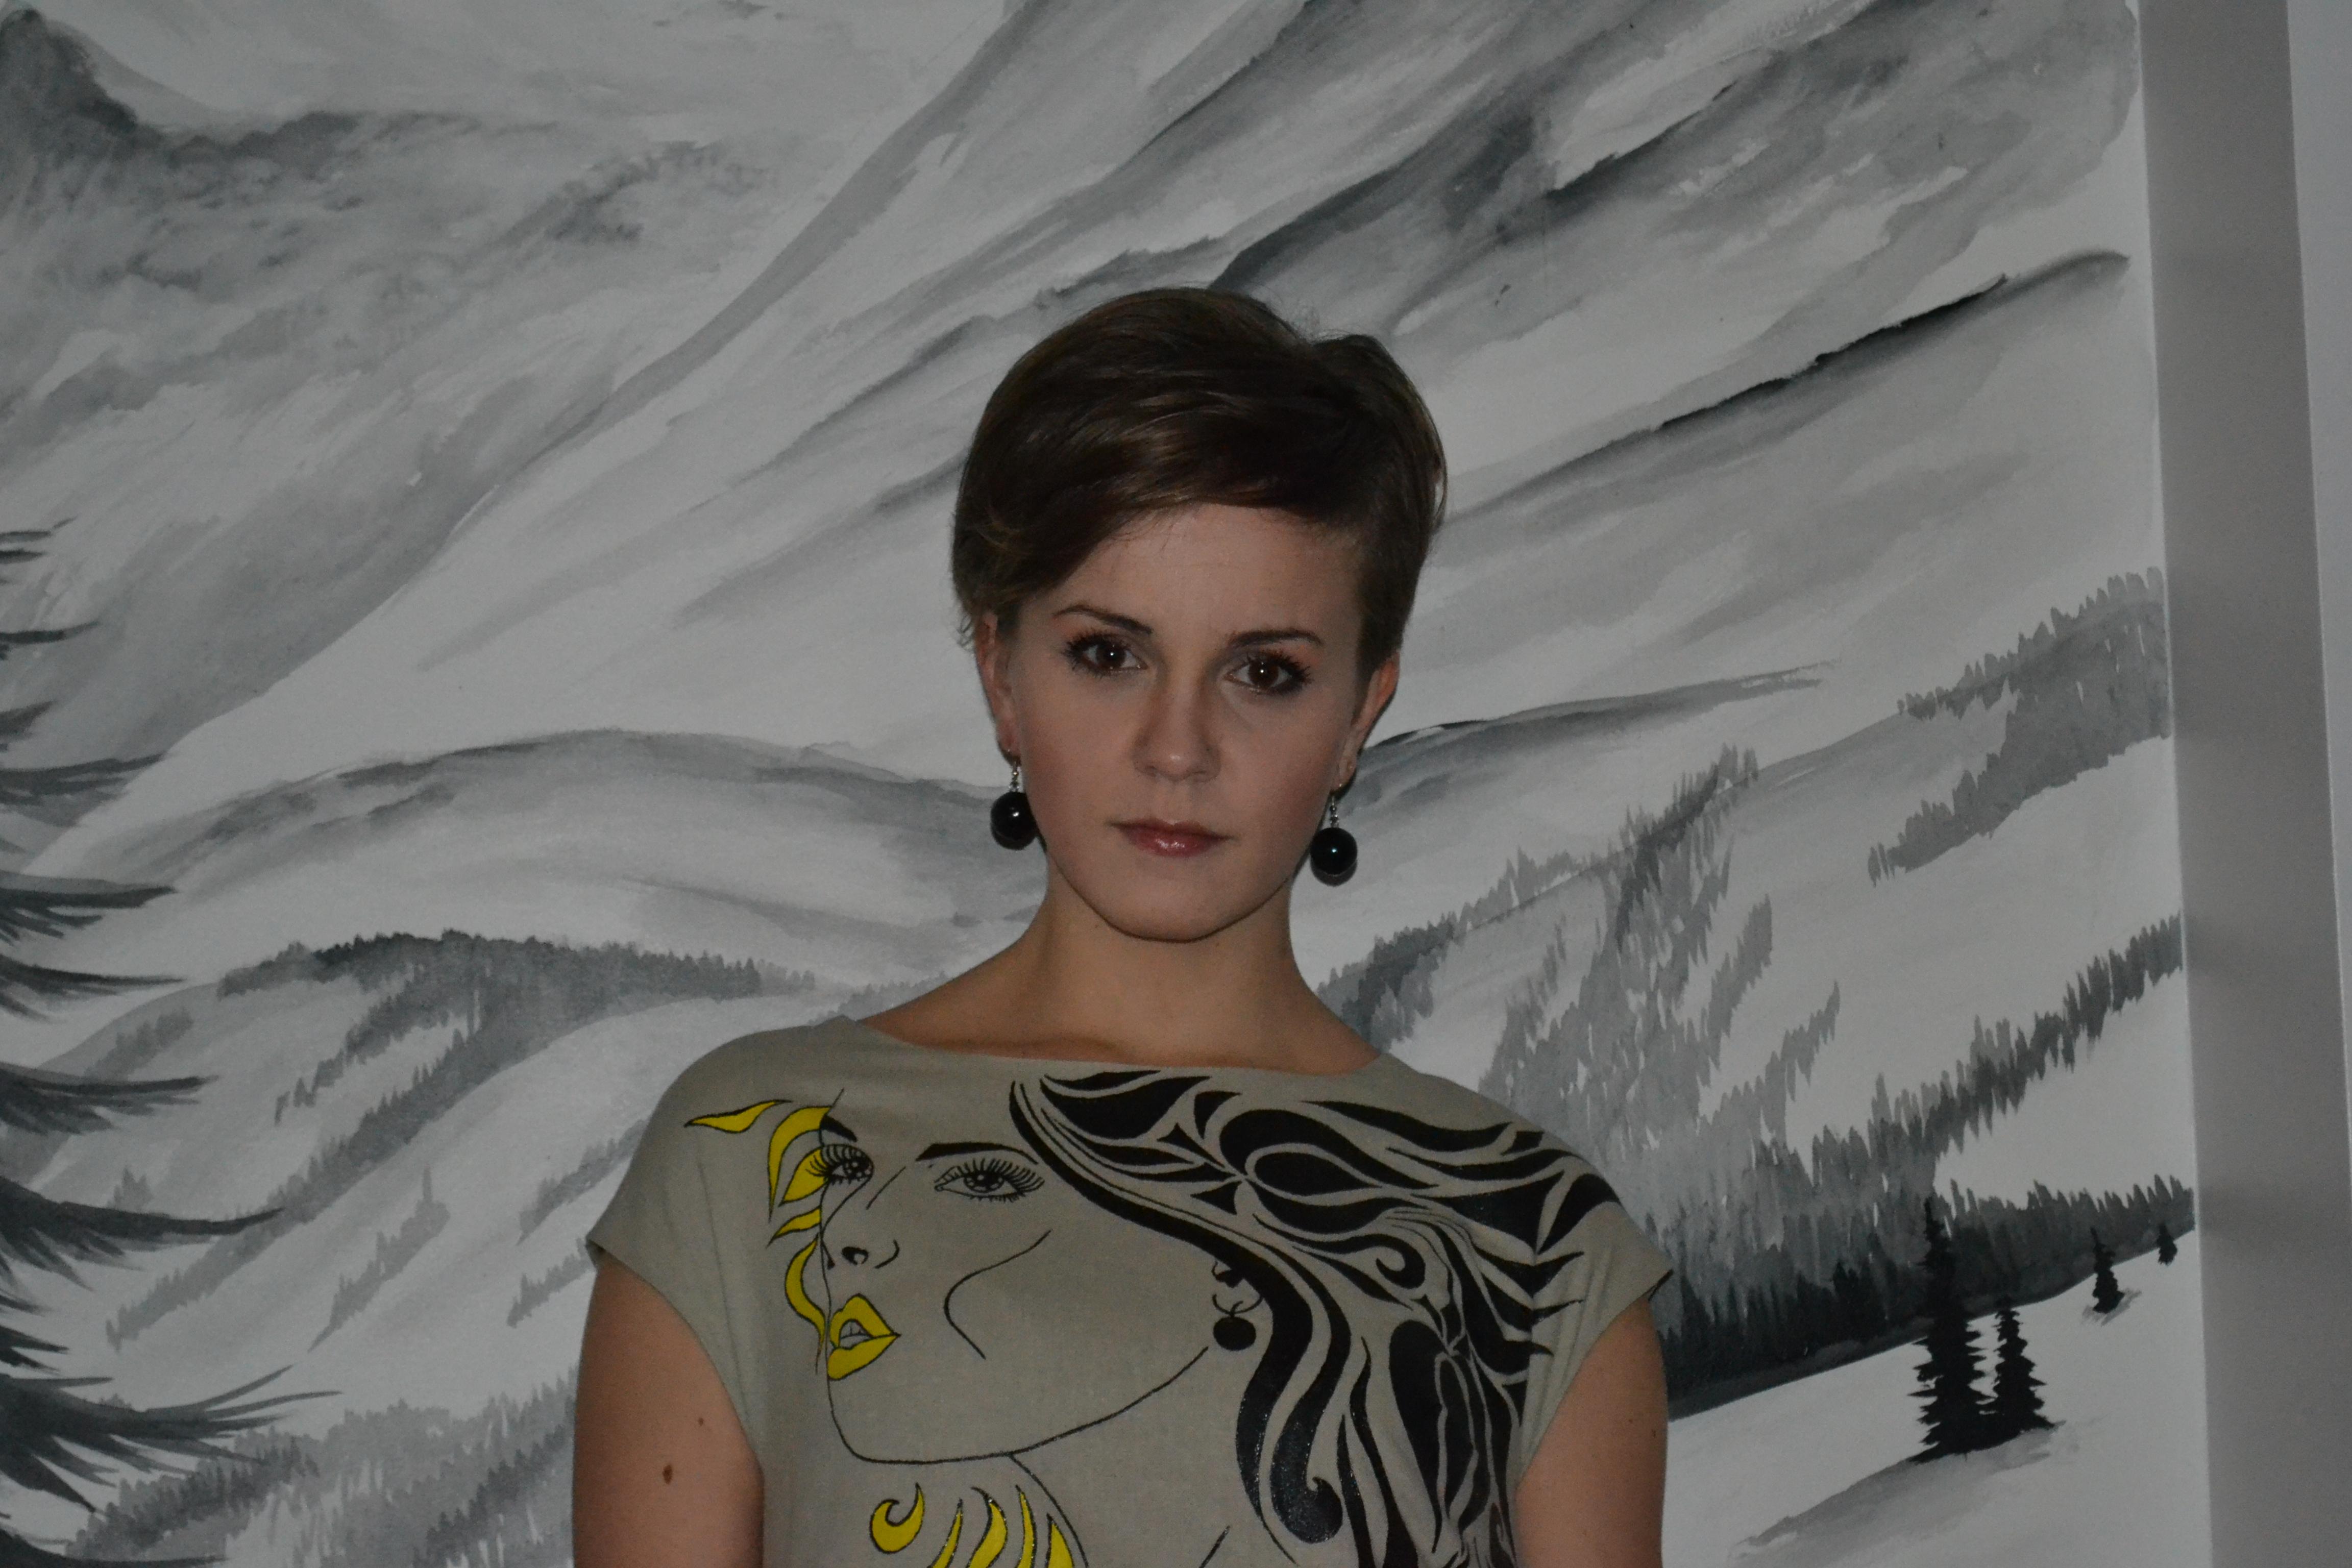 Anna Maryniarczyk-Kubińska's Signature